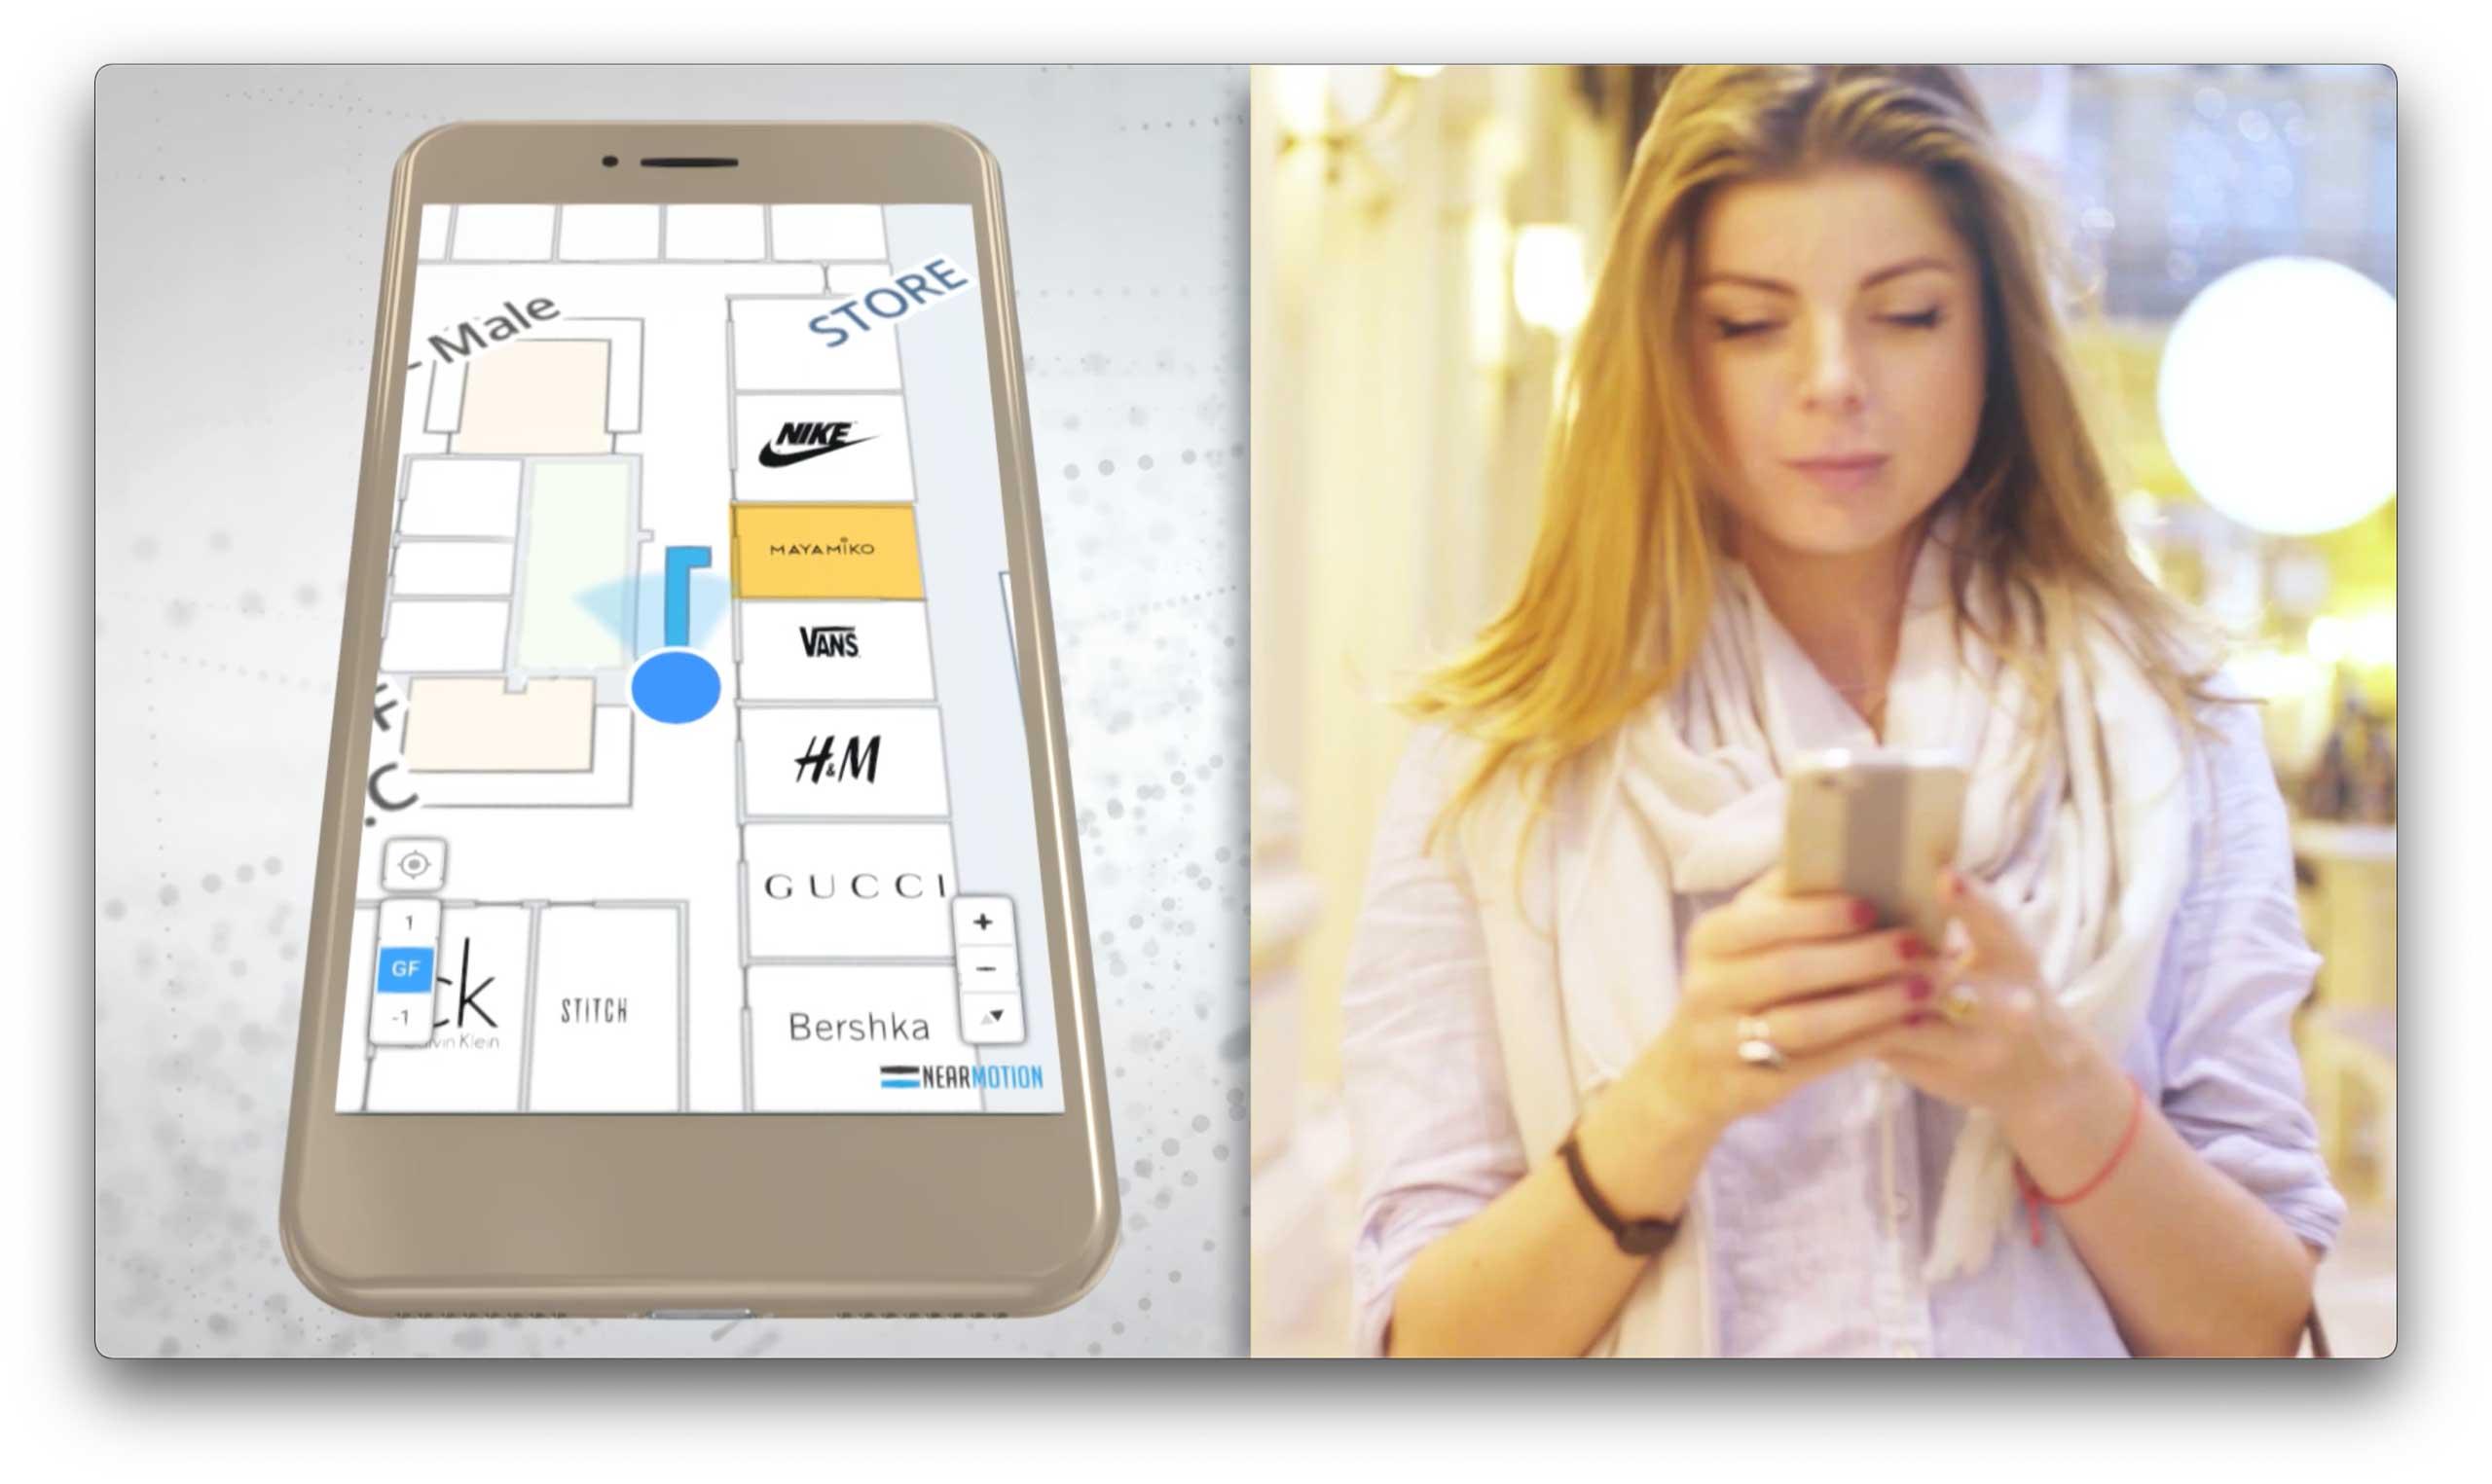 nteractive digital mapping